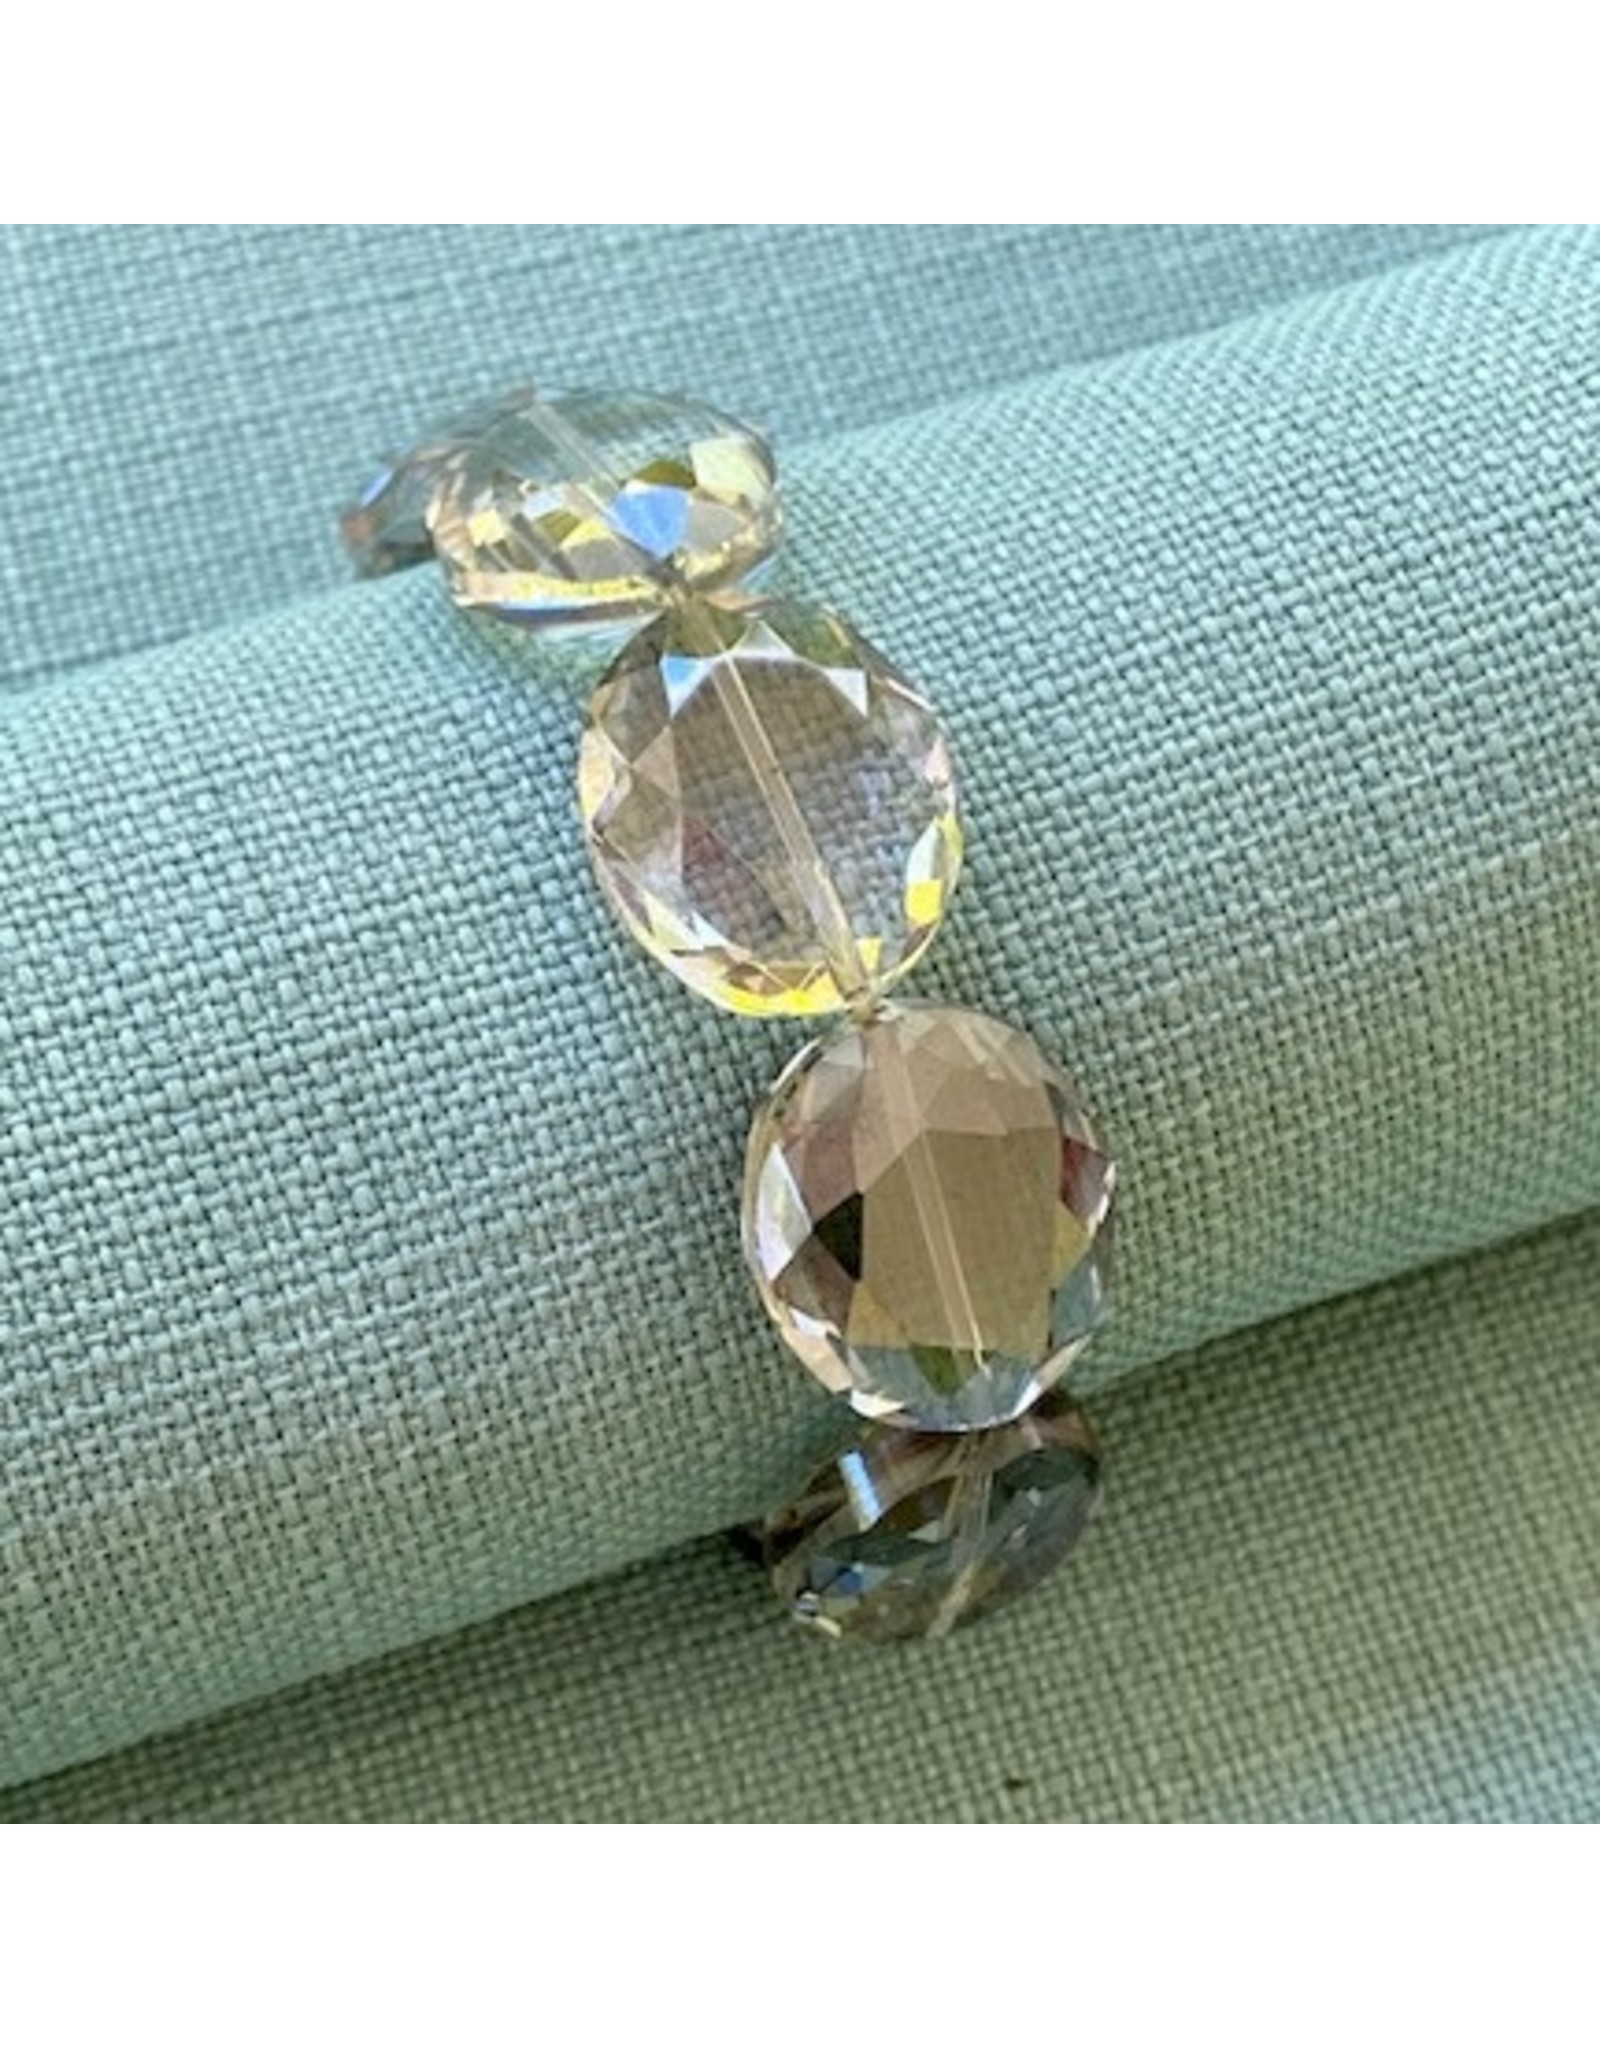 Deborah Grivas Design gri/db185/lstrech/bracelet